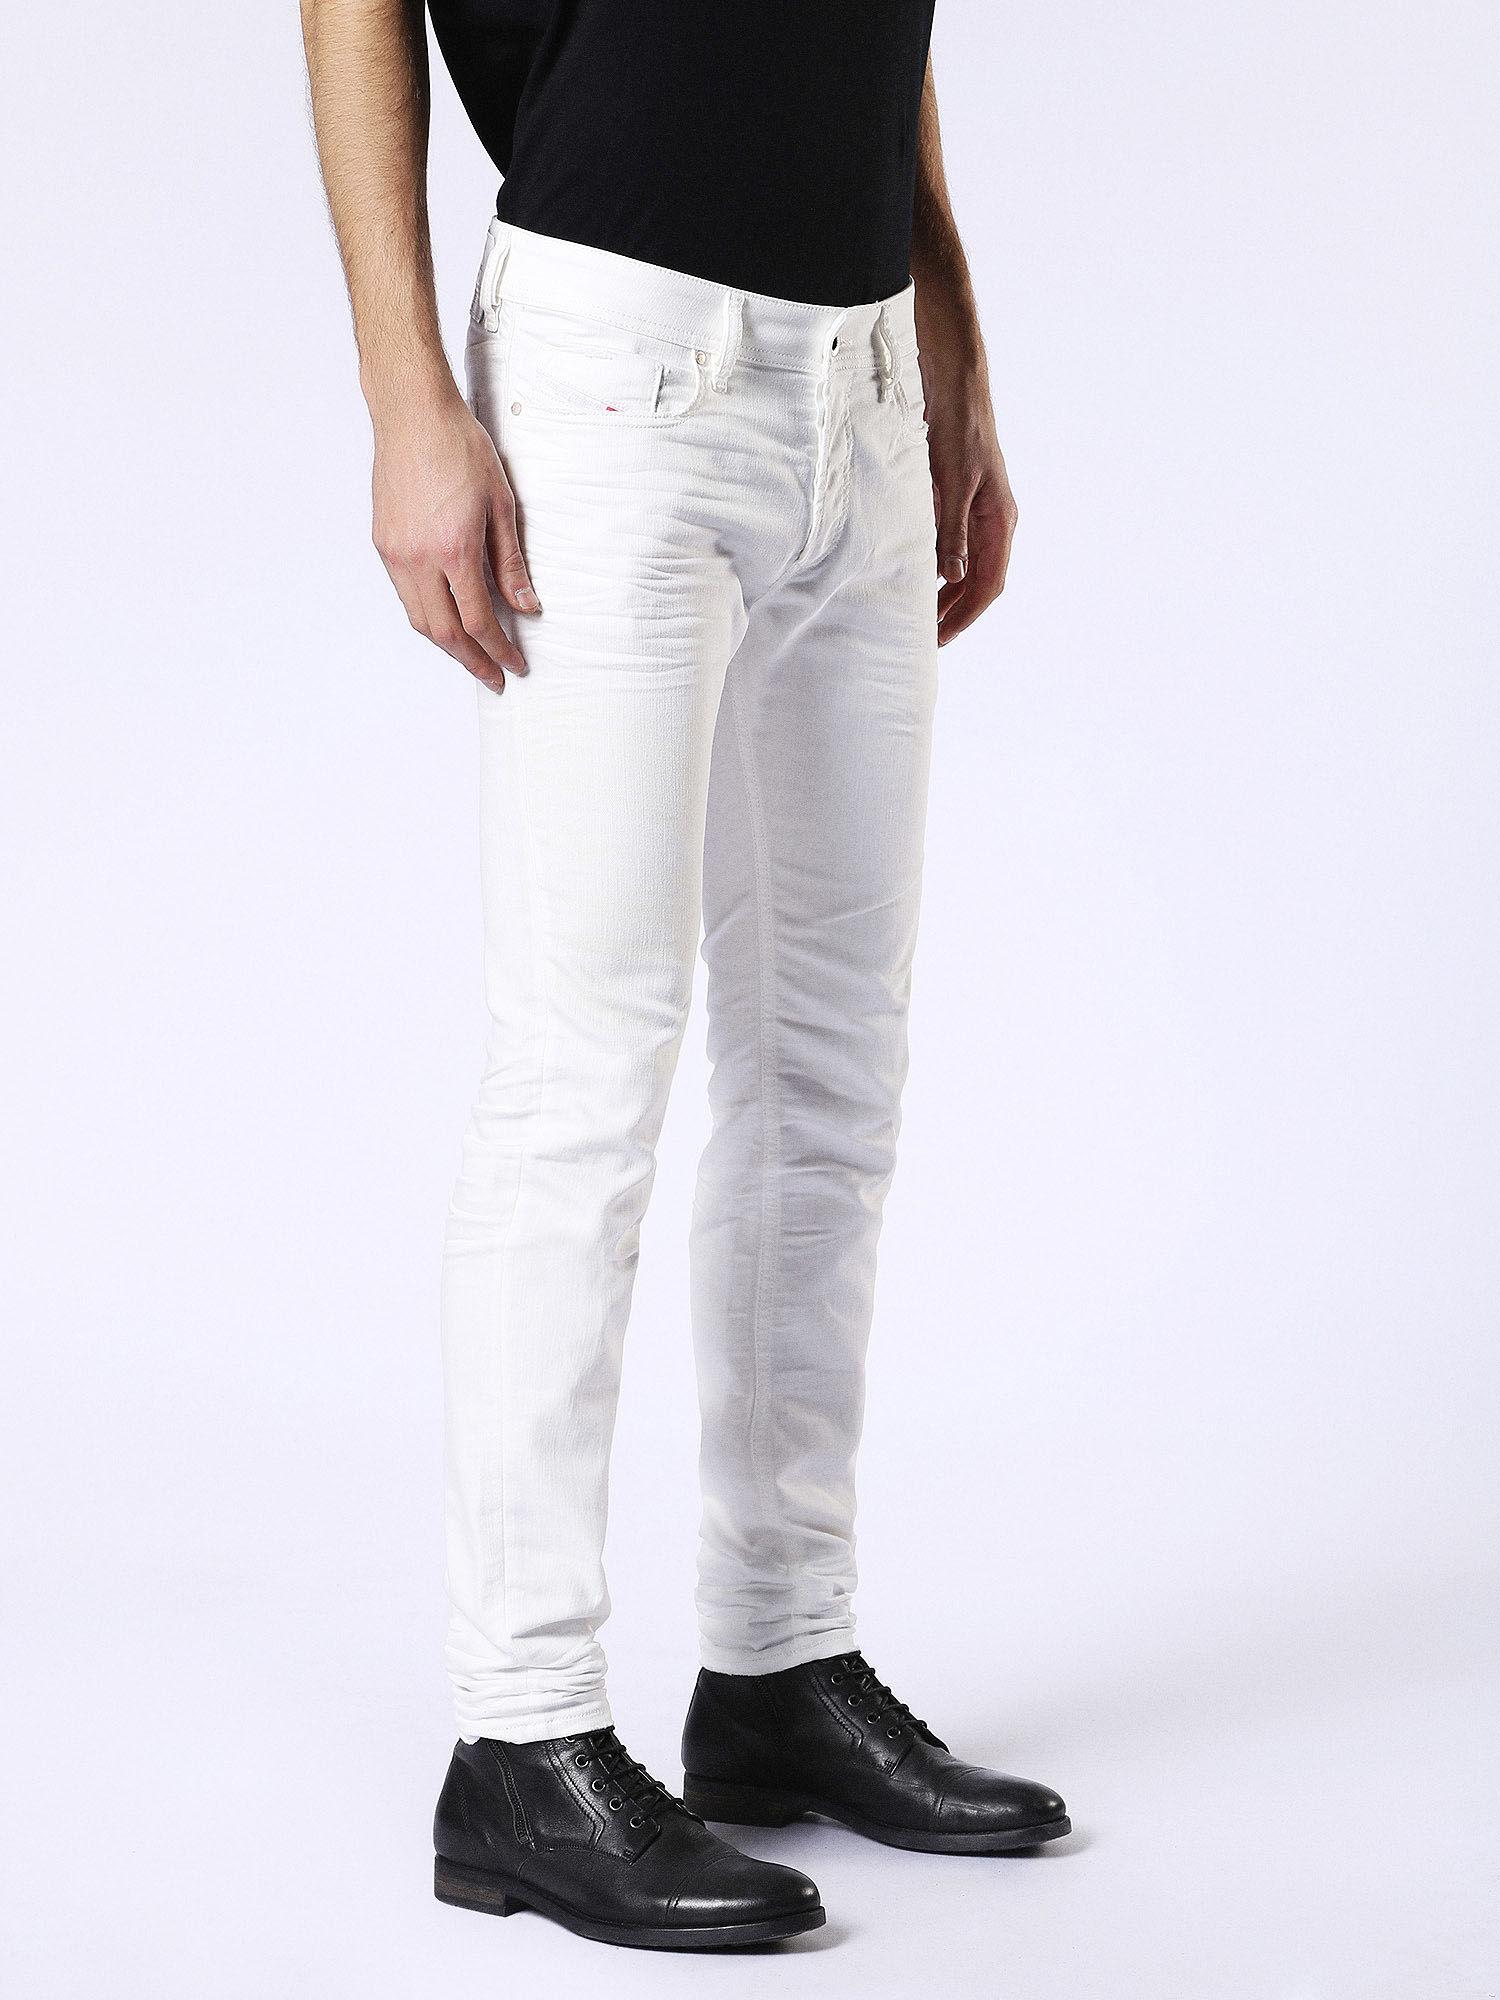 b92f47e0 00S7VG084CY Diesel SLEENKER 084CY: skinny Jeans Man White